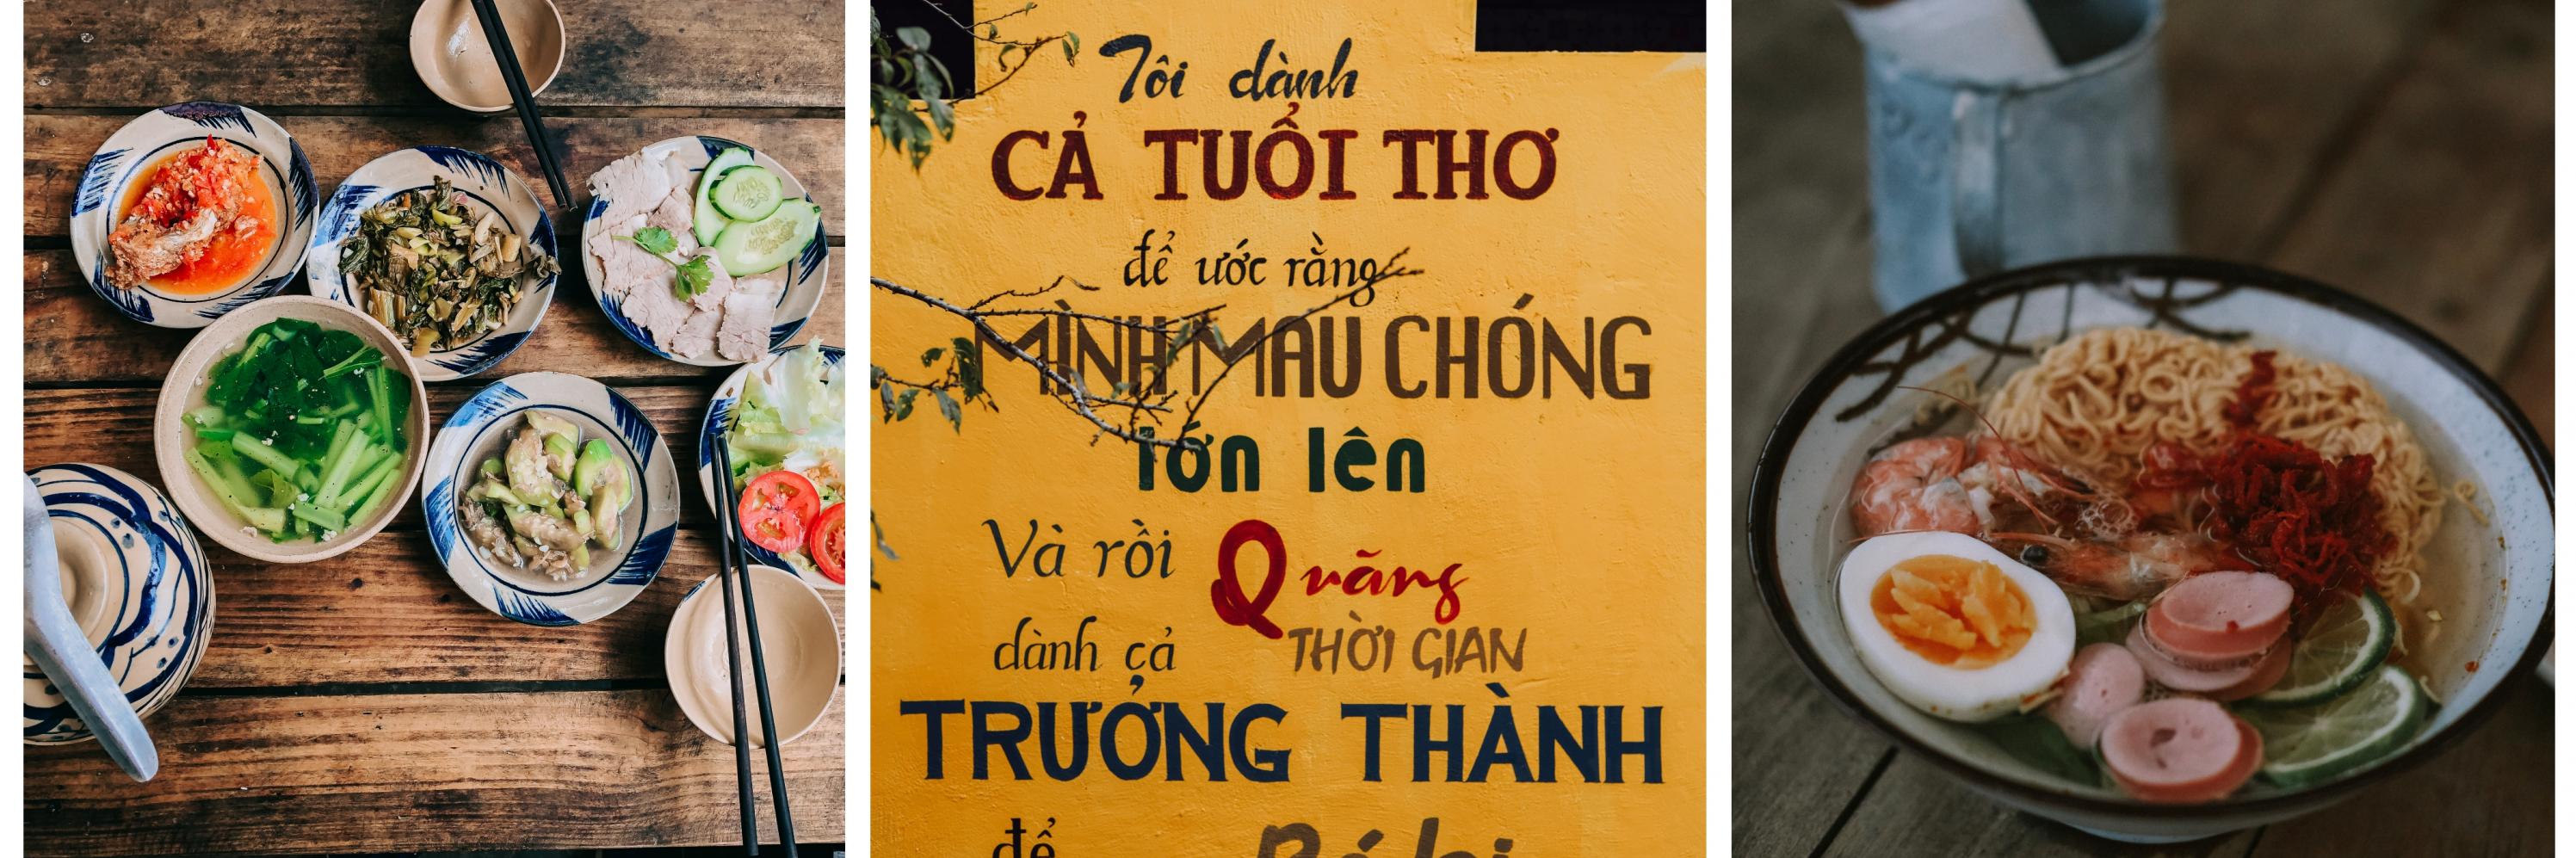 https://gody.vn/blog/tuananhhunre9193/post/toi-da-lat-minh-di-an-com-7143